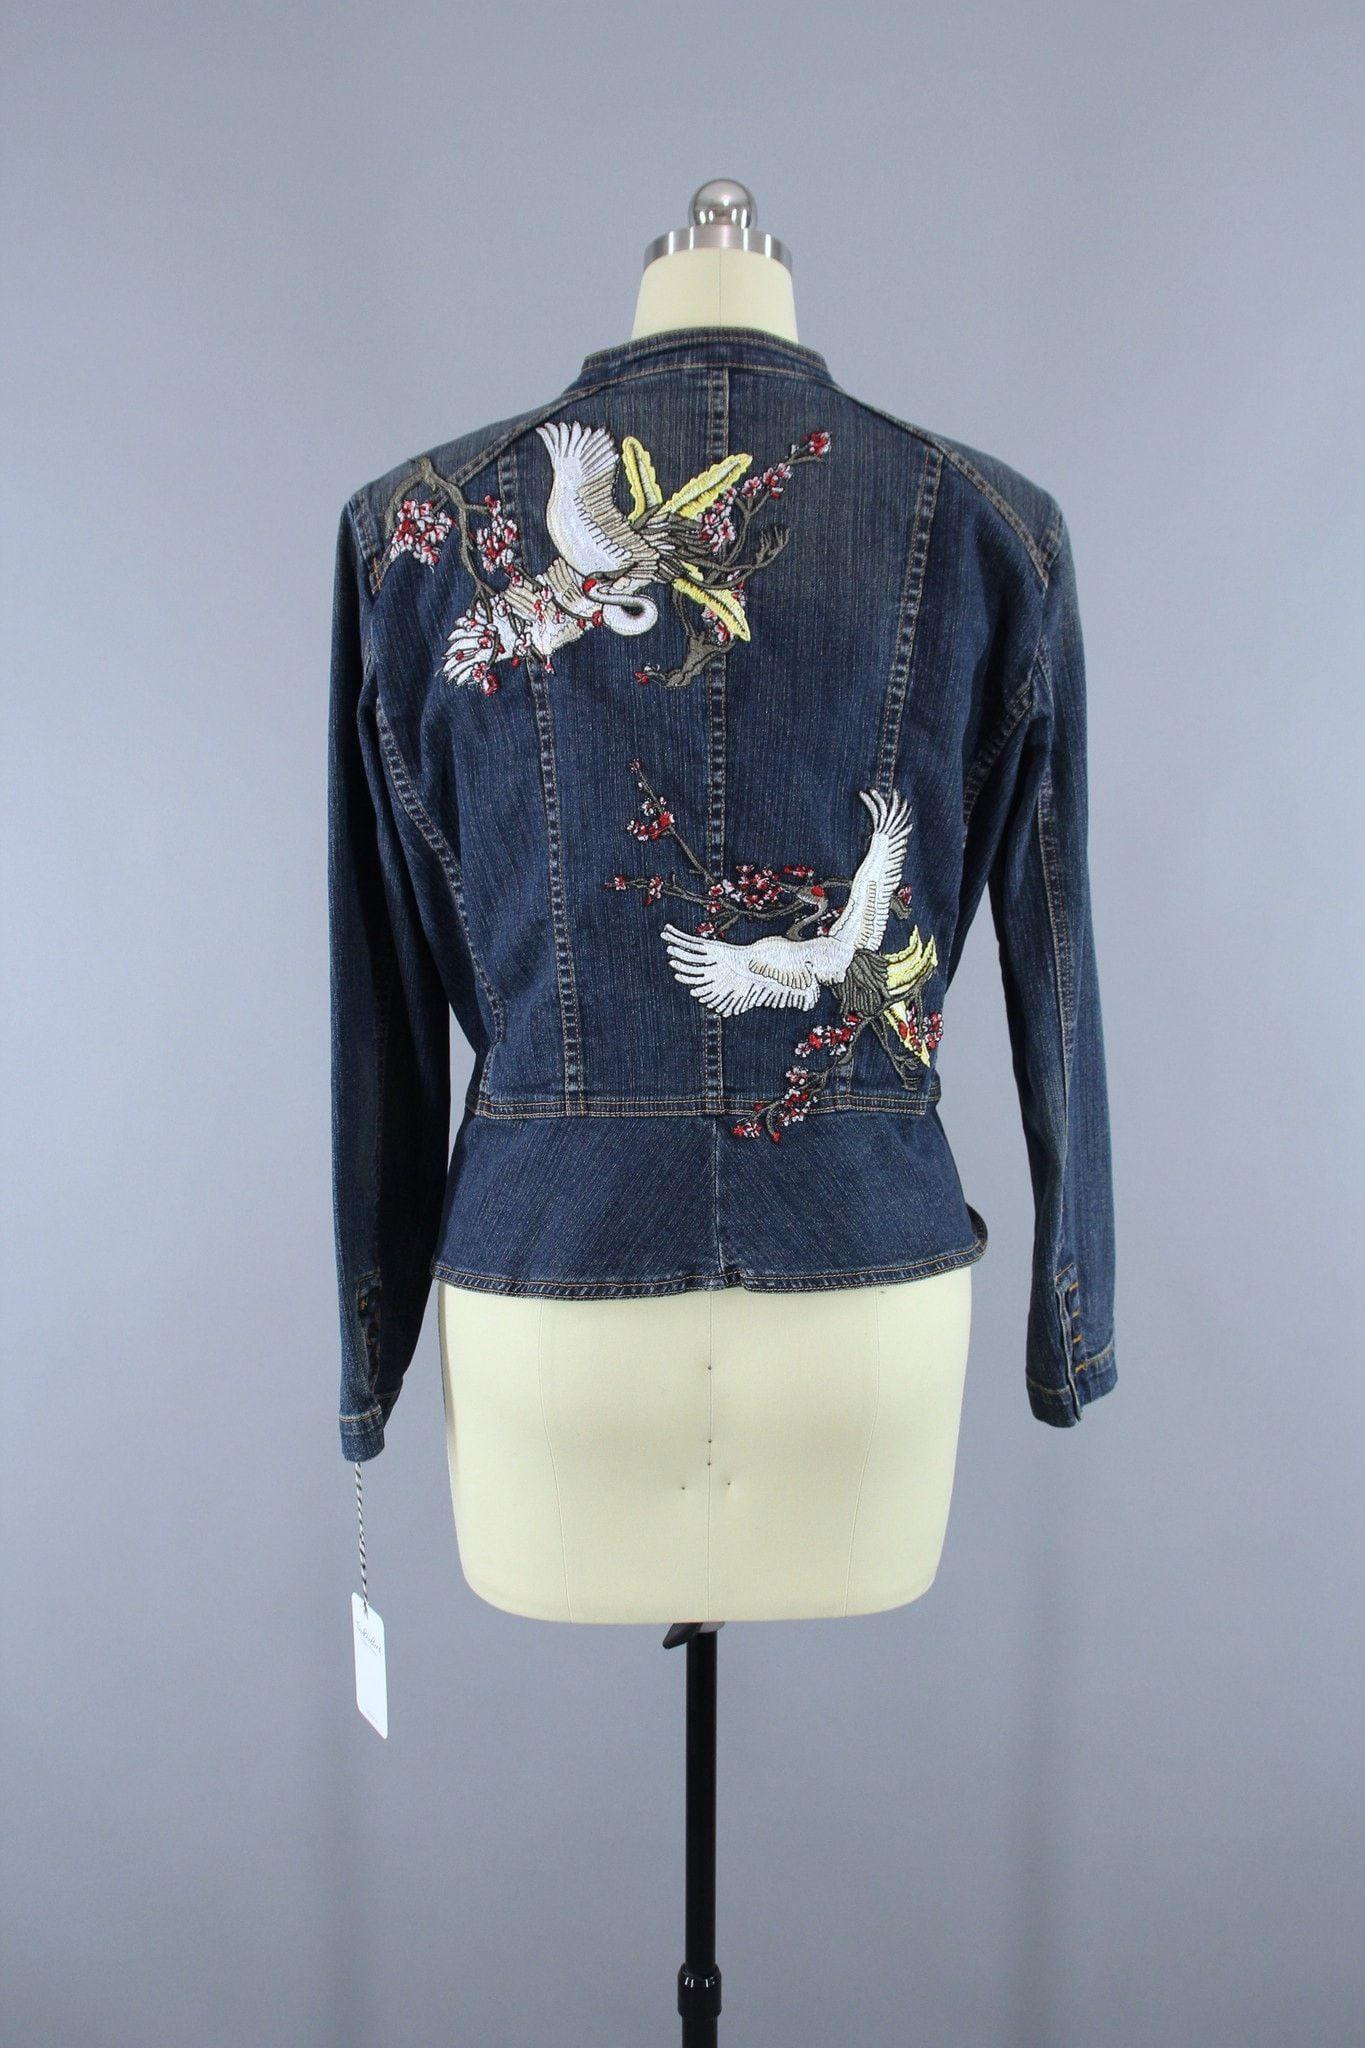 Military style denim peplum jacket with asian cranes birds